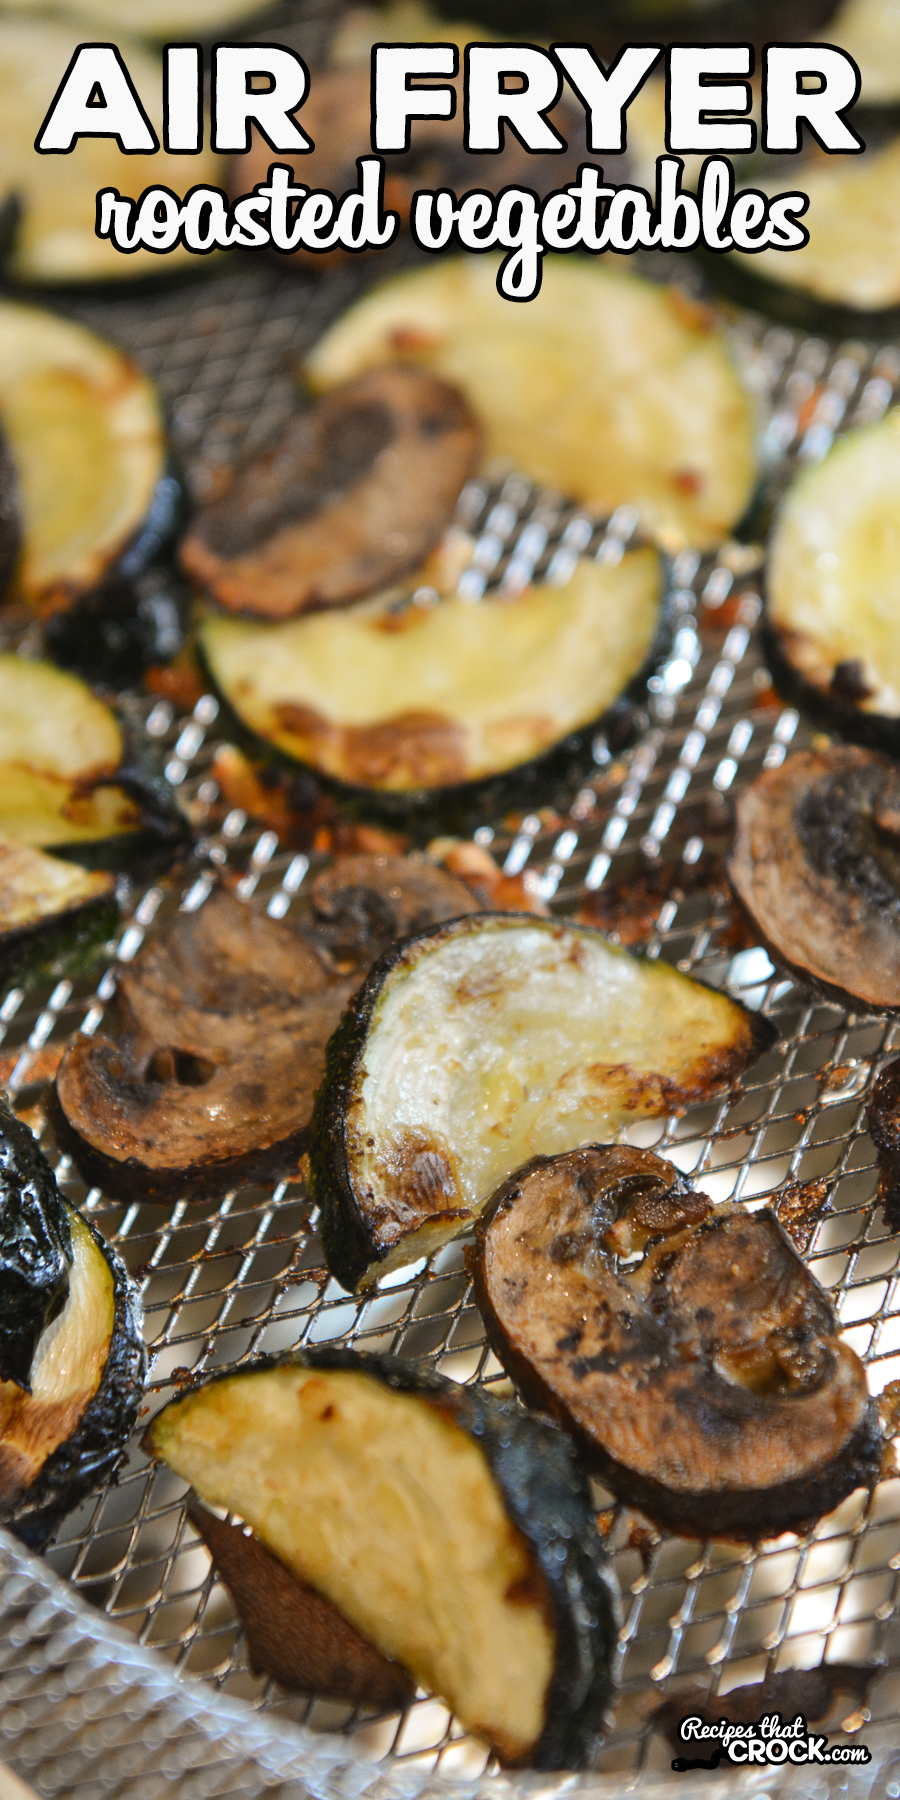 Pin on Air Fryer Recipes (Traditional and Ninja Foodi)